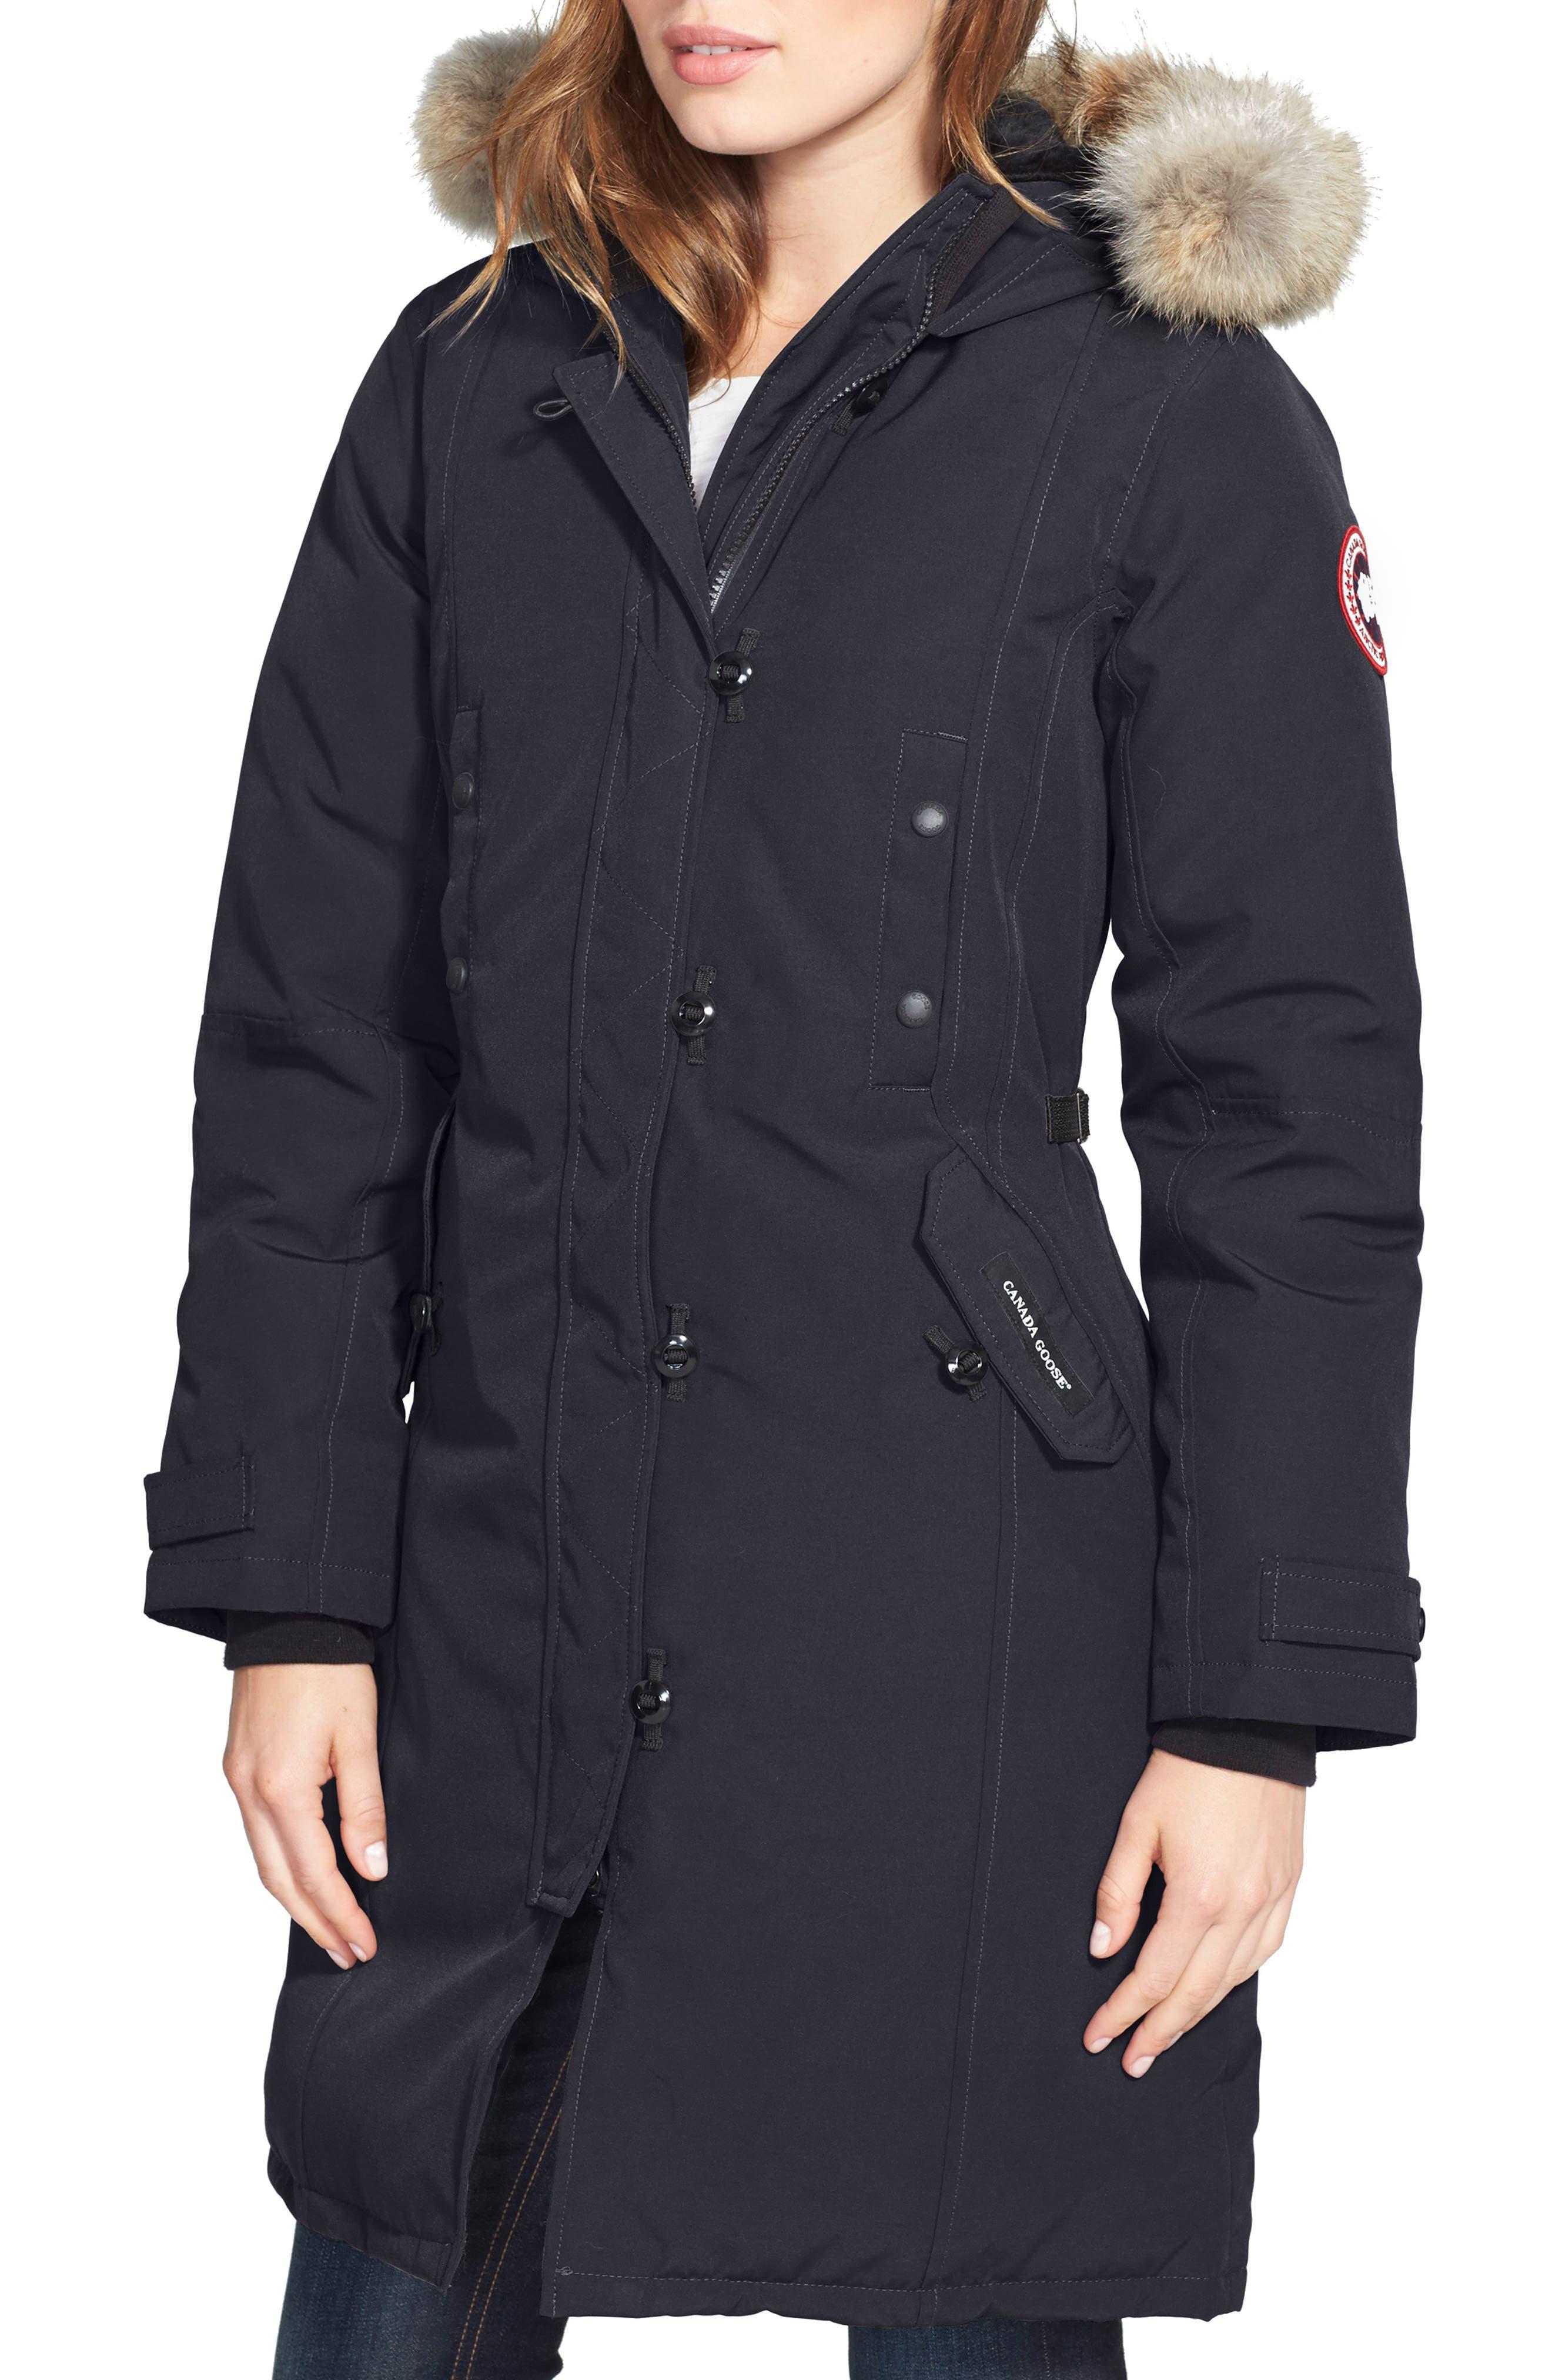 Womens khaki jacket with hood